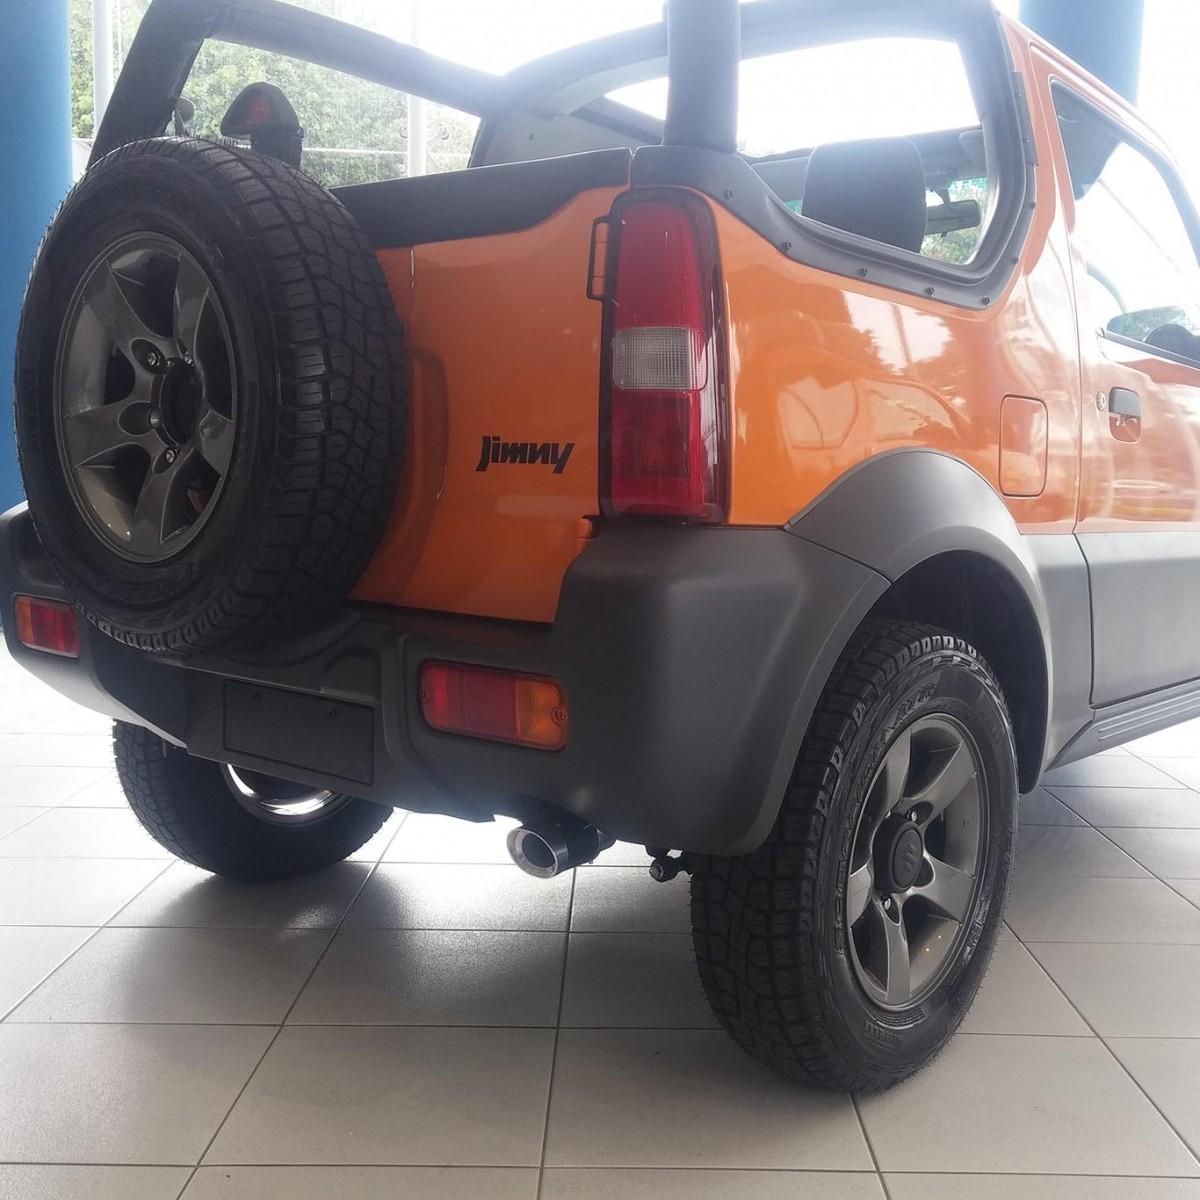 Ponteiras Elite Carbono Suzuki Jimny